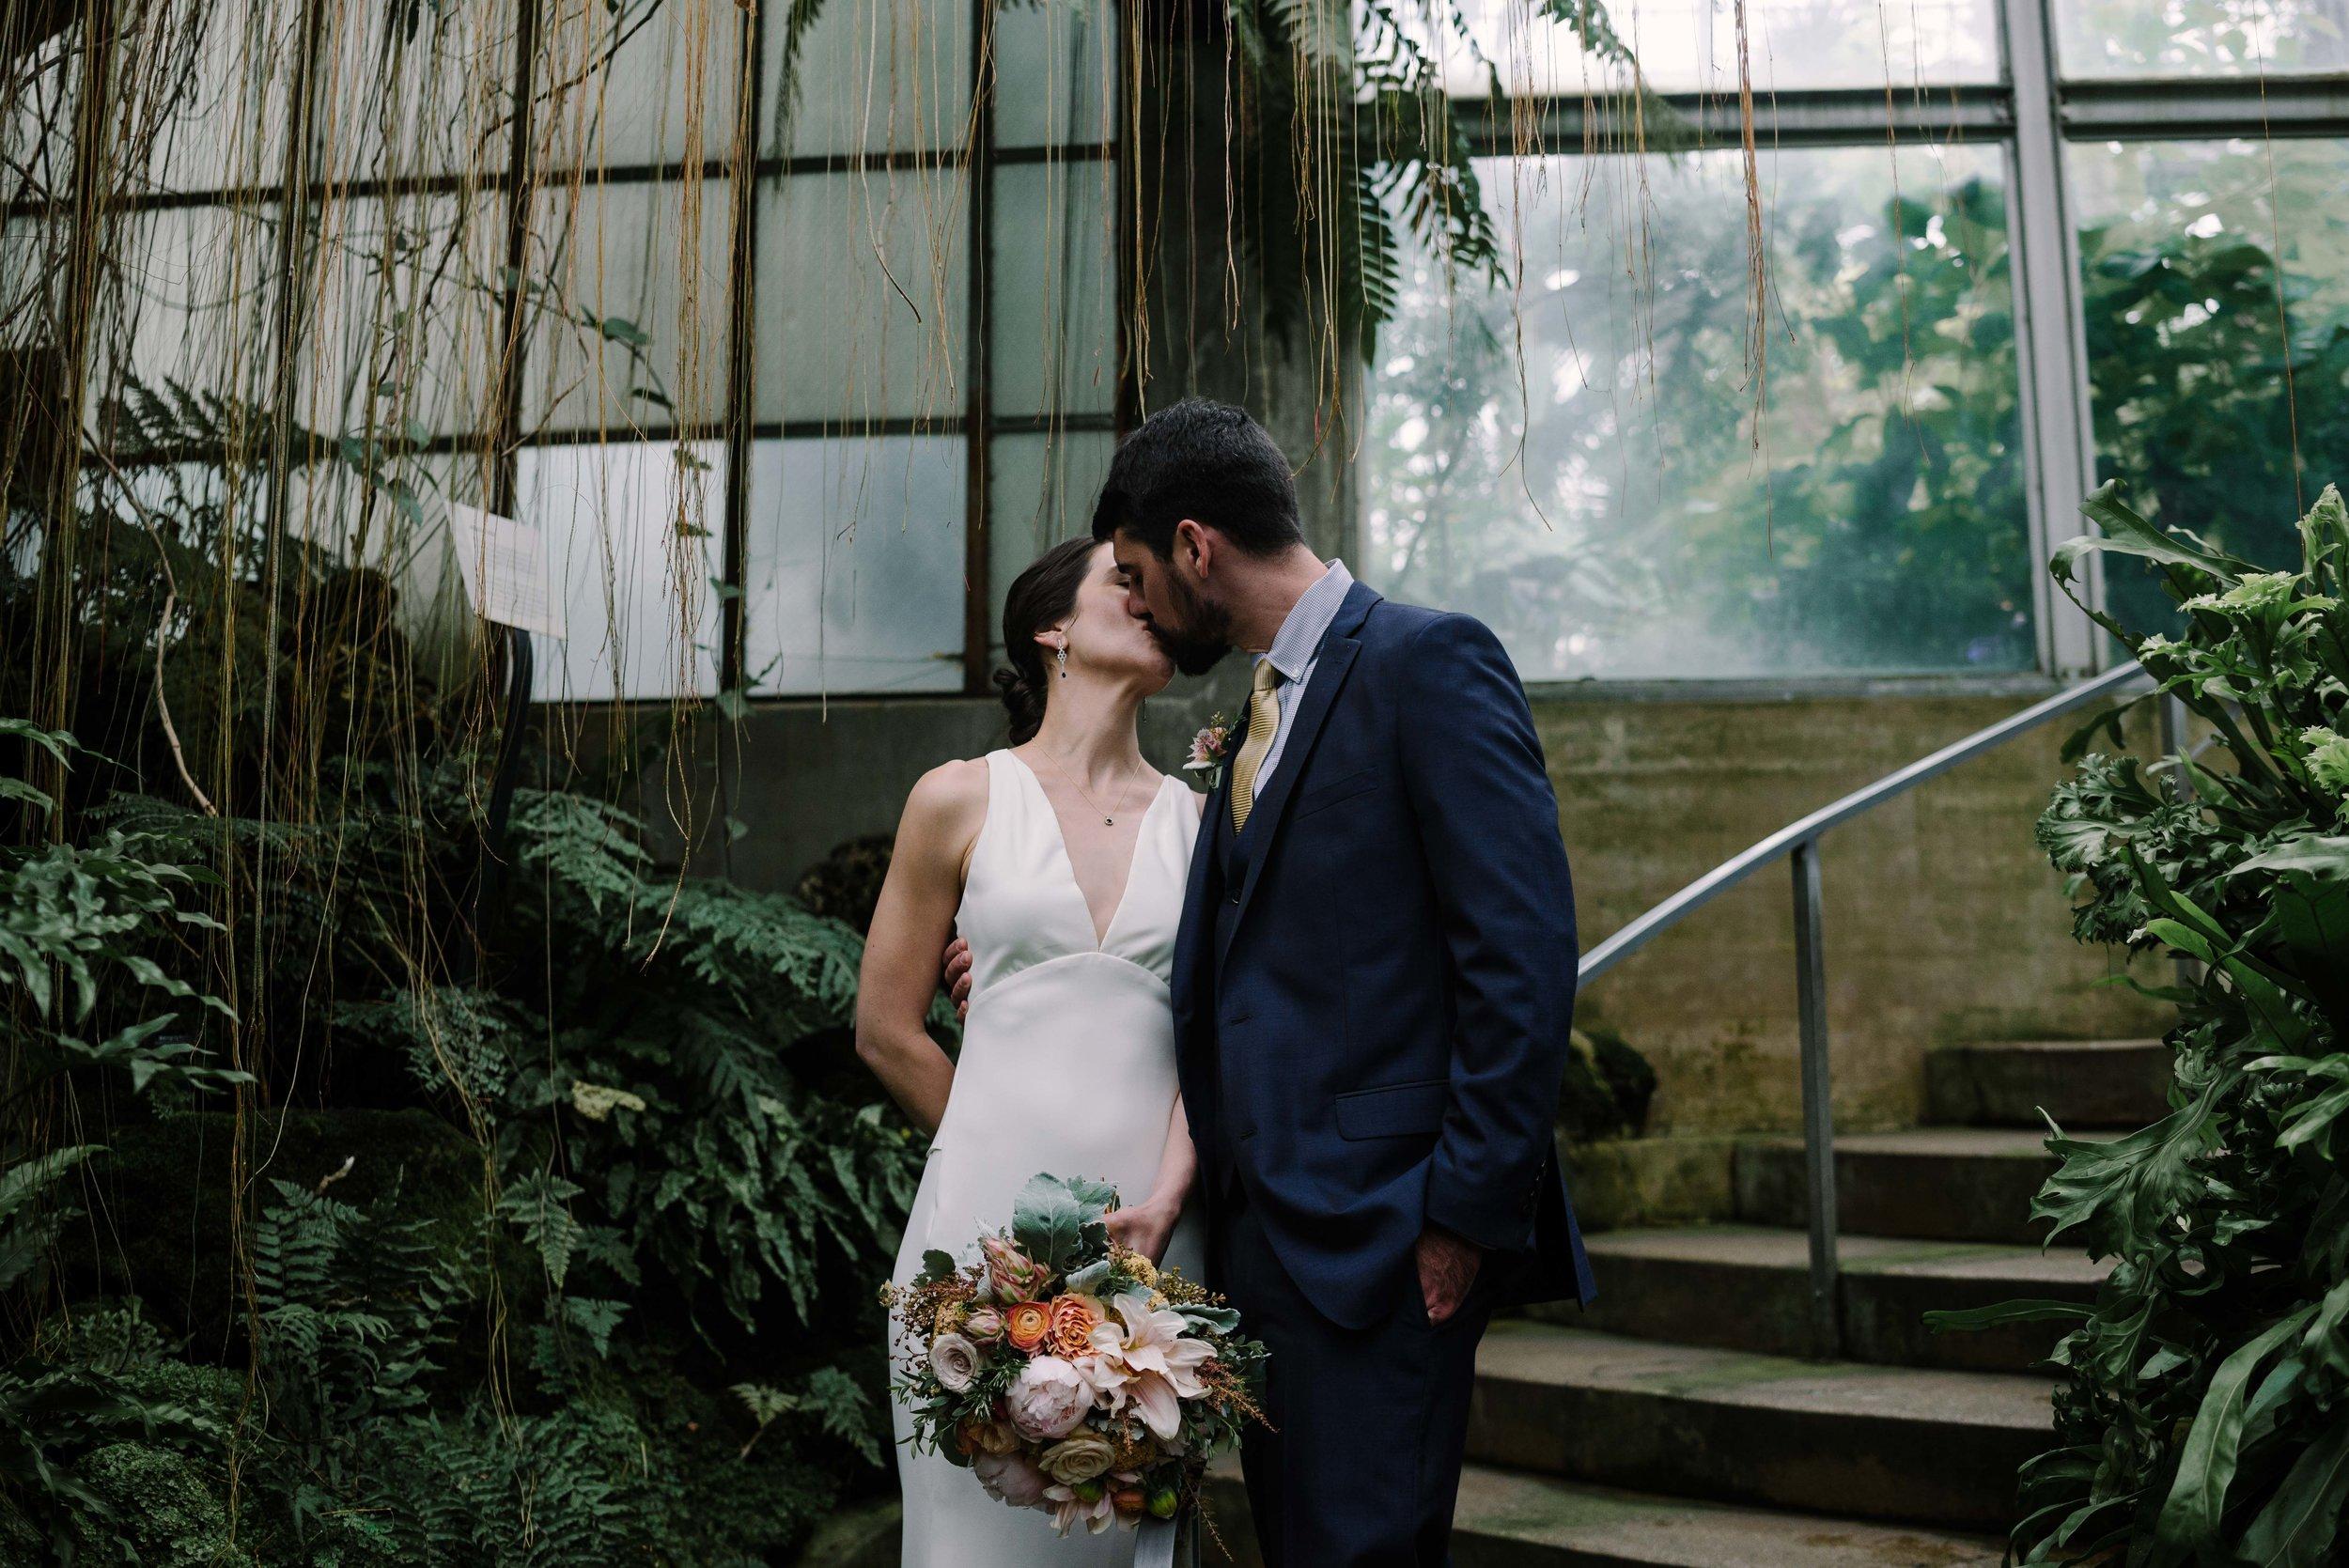 Patricia-Steve-Blog-Indianapolis-Wedding-35.jpg